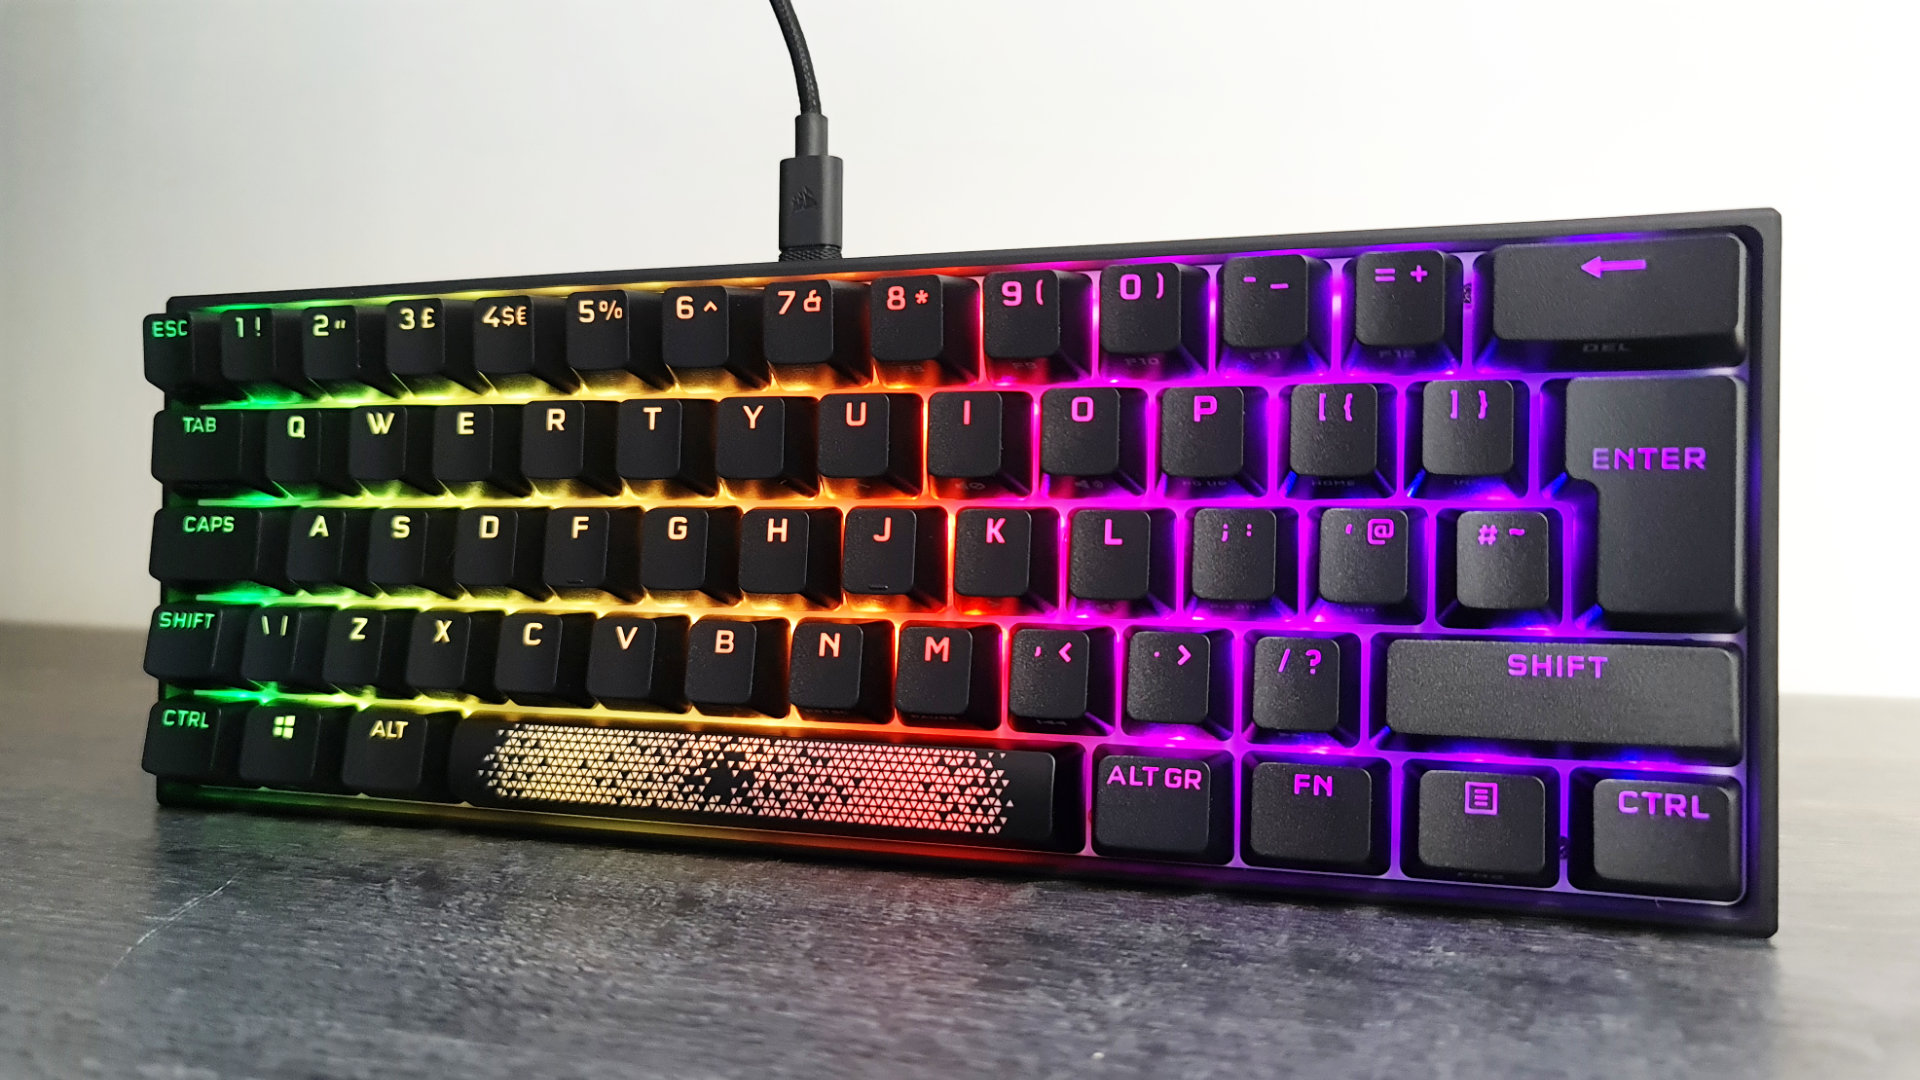 K65 MINI 60% MECANICO RGB - CORSAIR